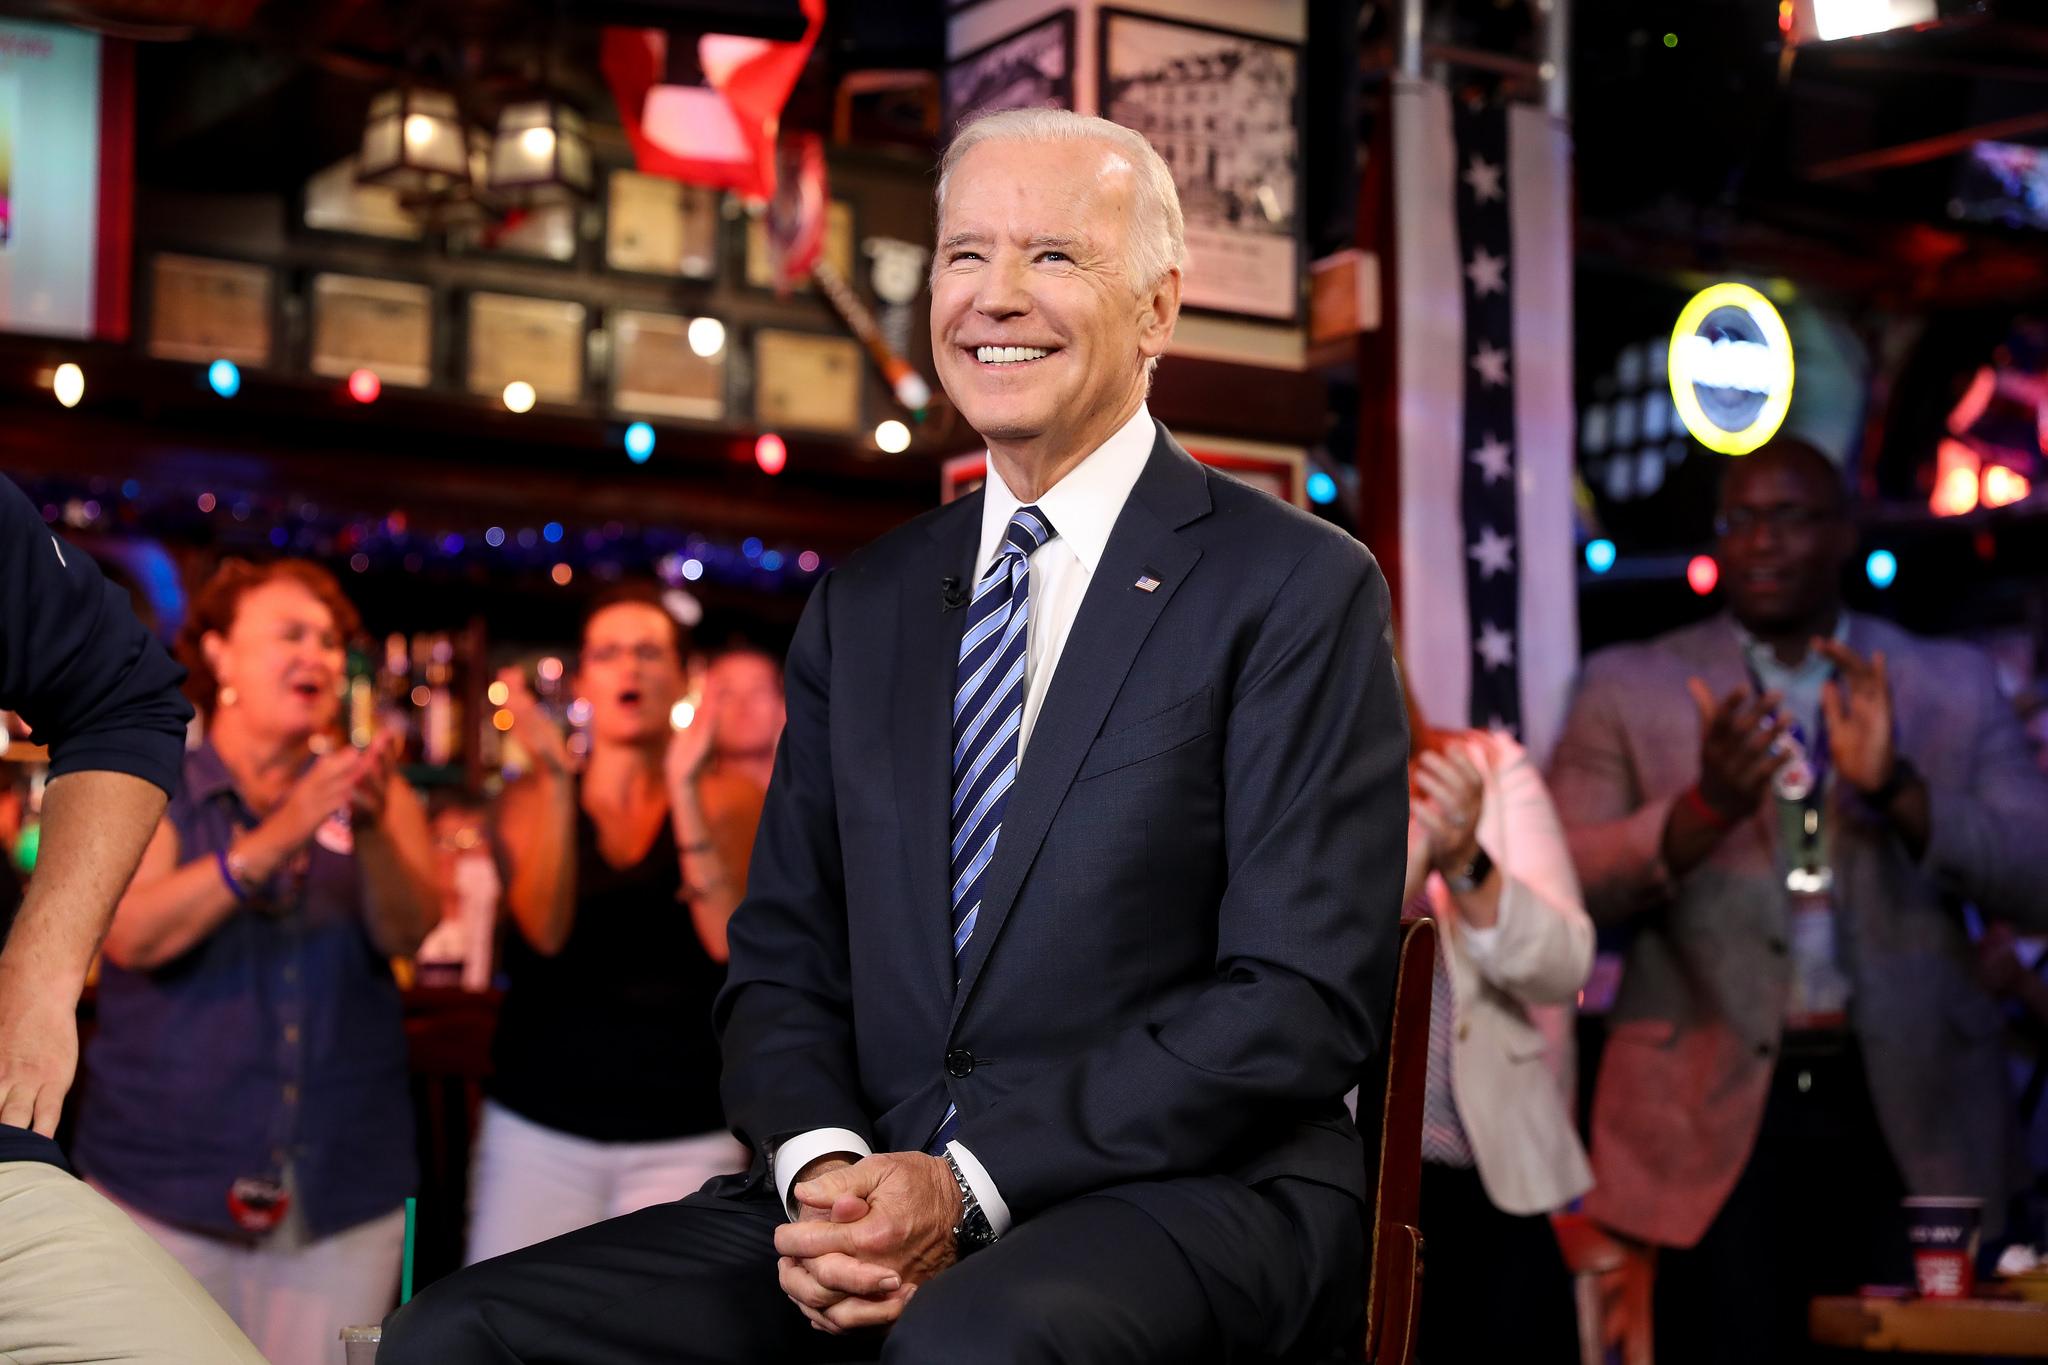 Vice President Joe Biden visits McGillin's